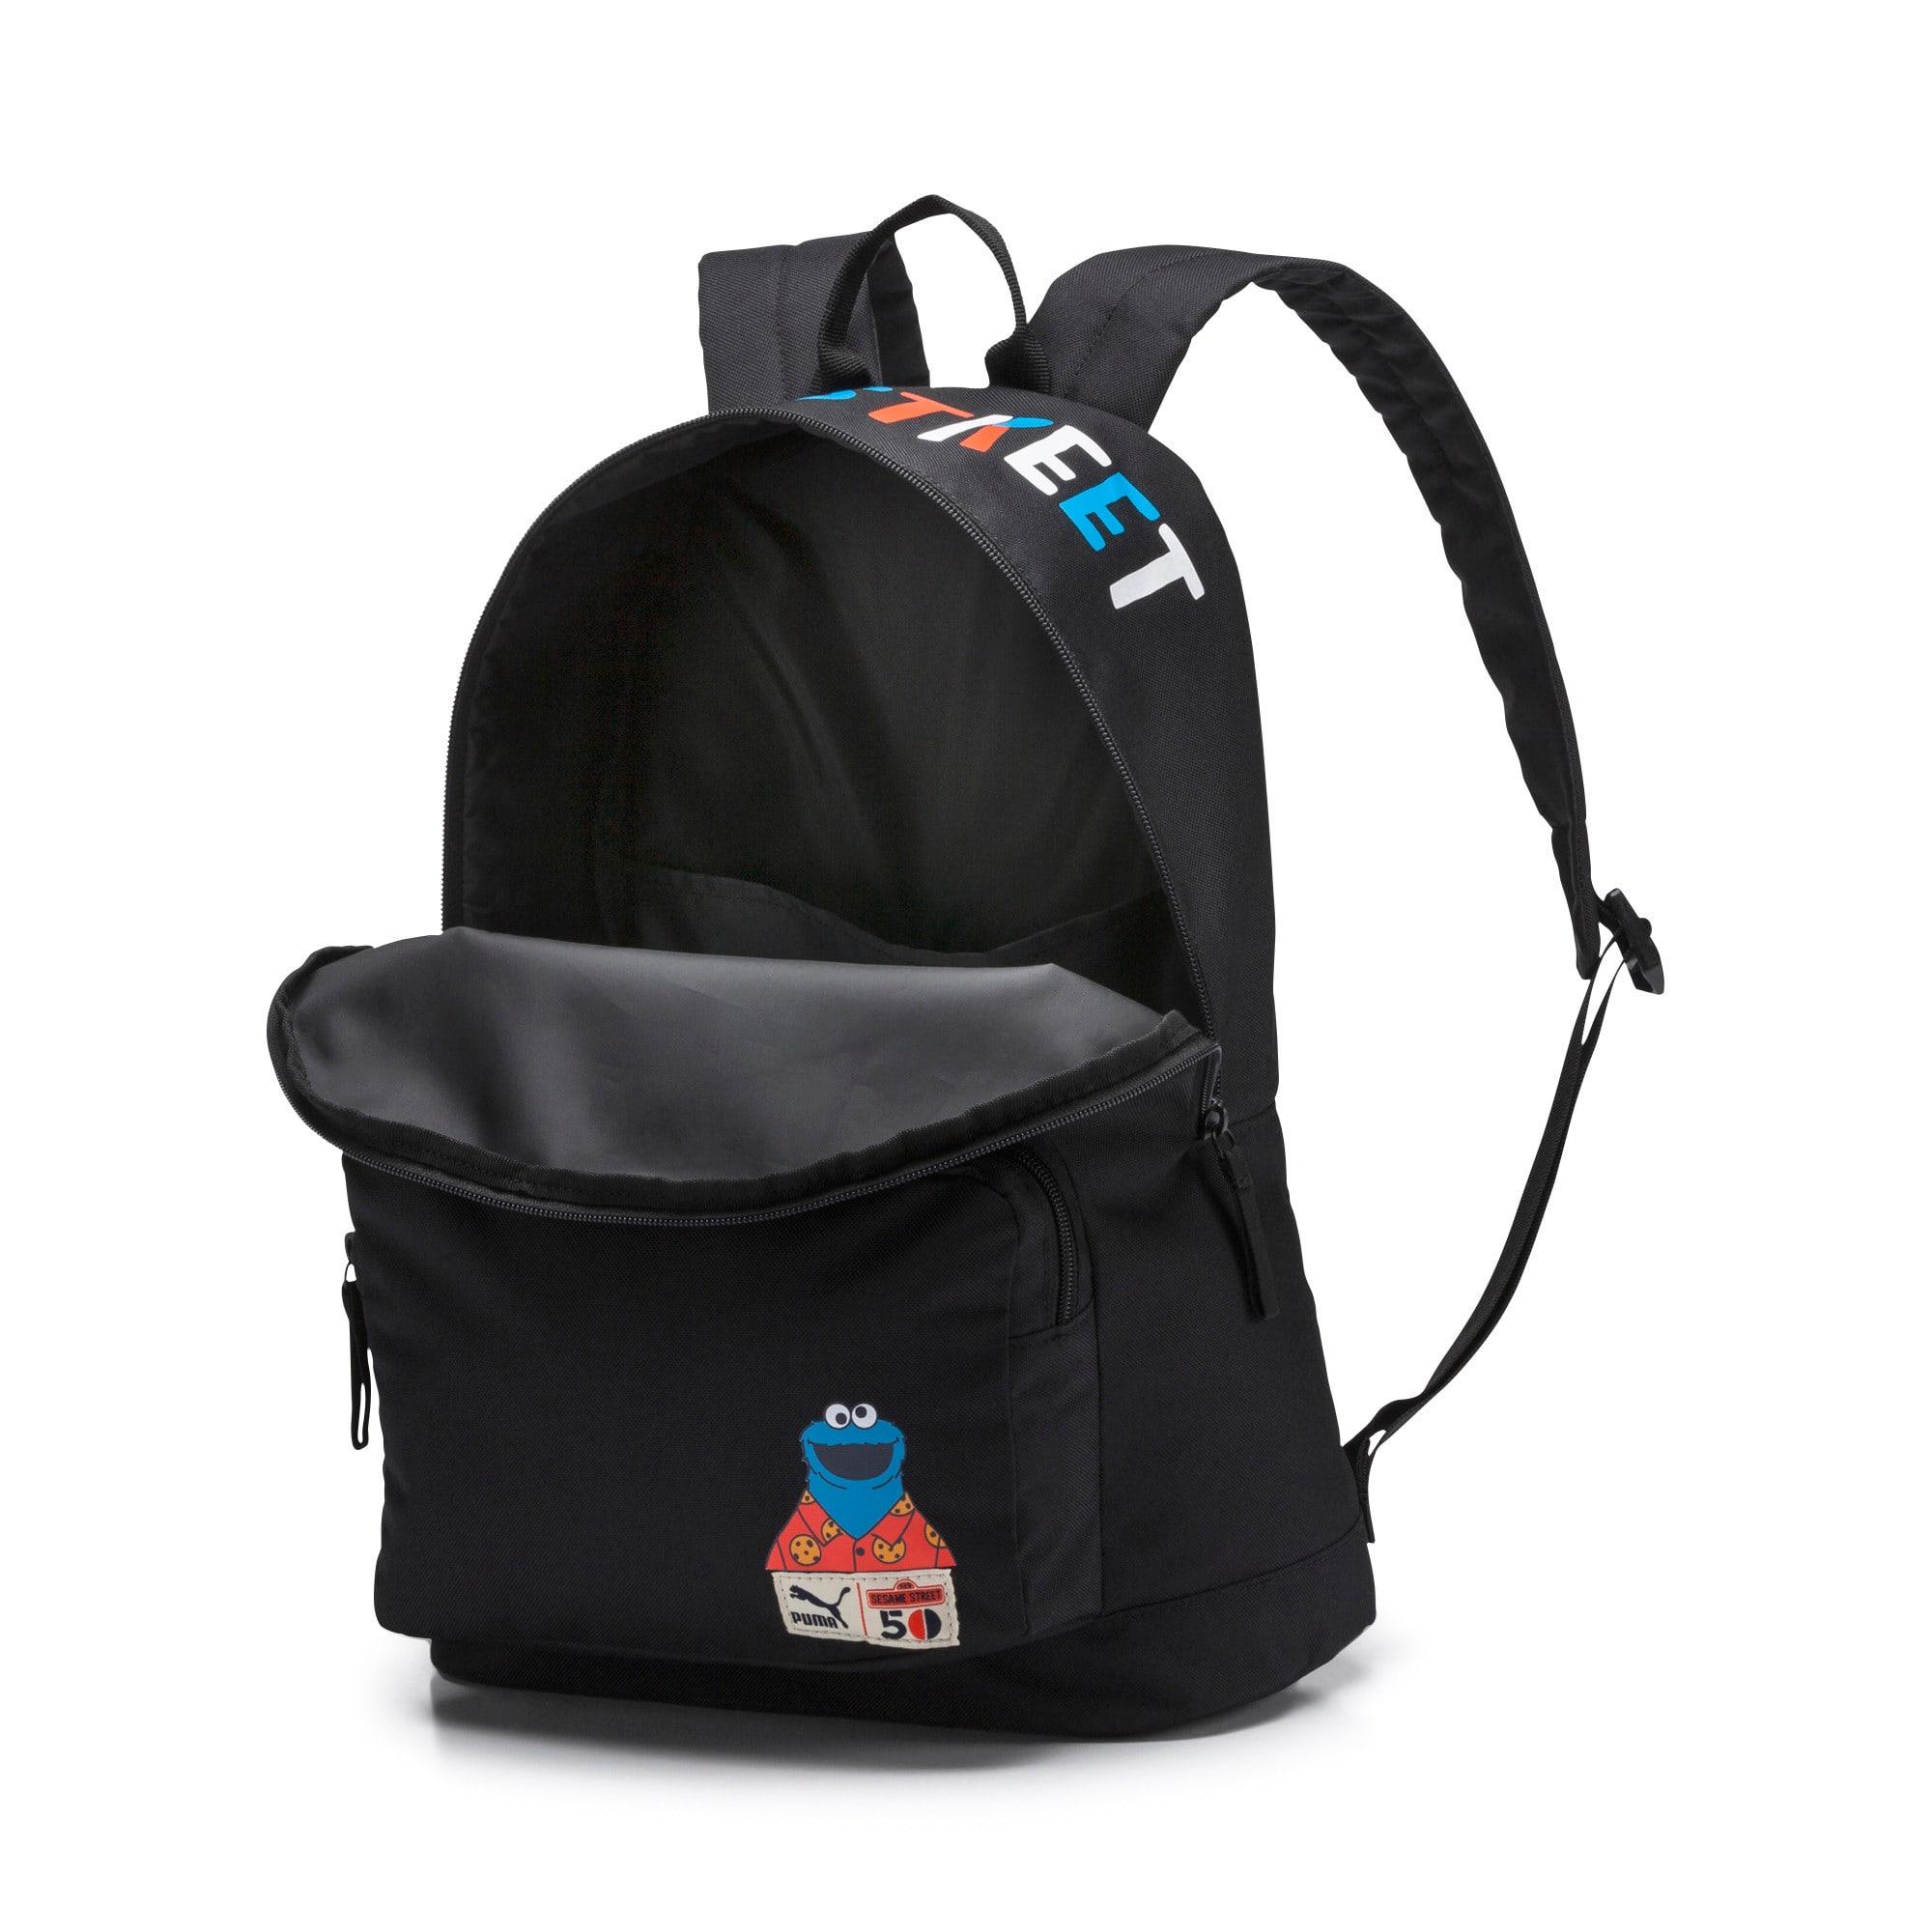 Thumbnail 3 of Sesame Street Kids' Backpack, Puma Black, medium